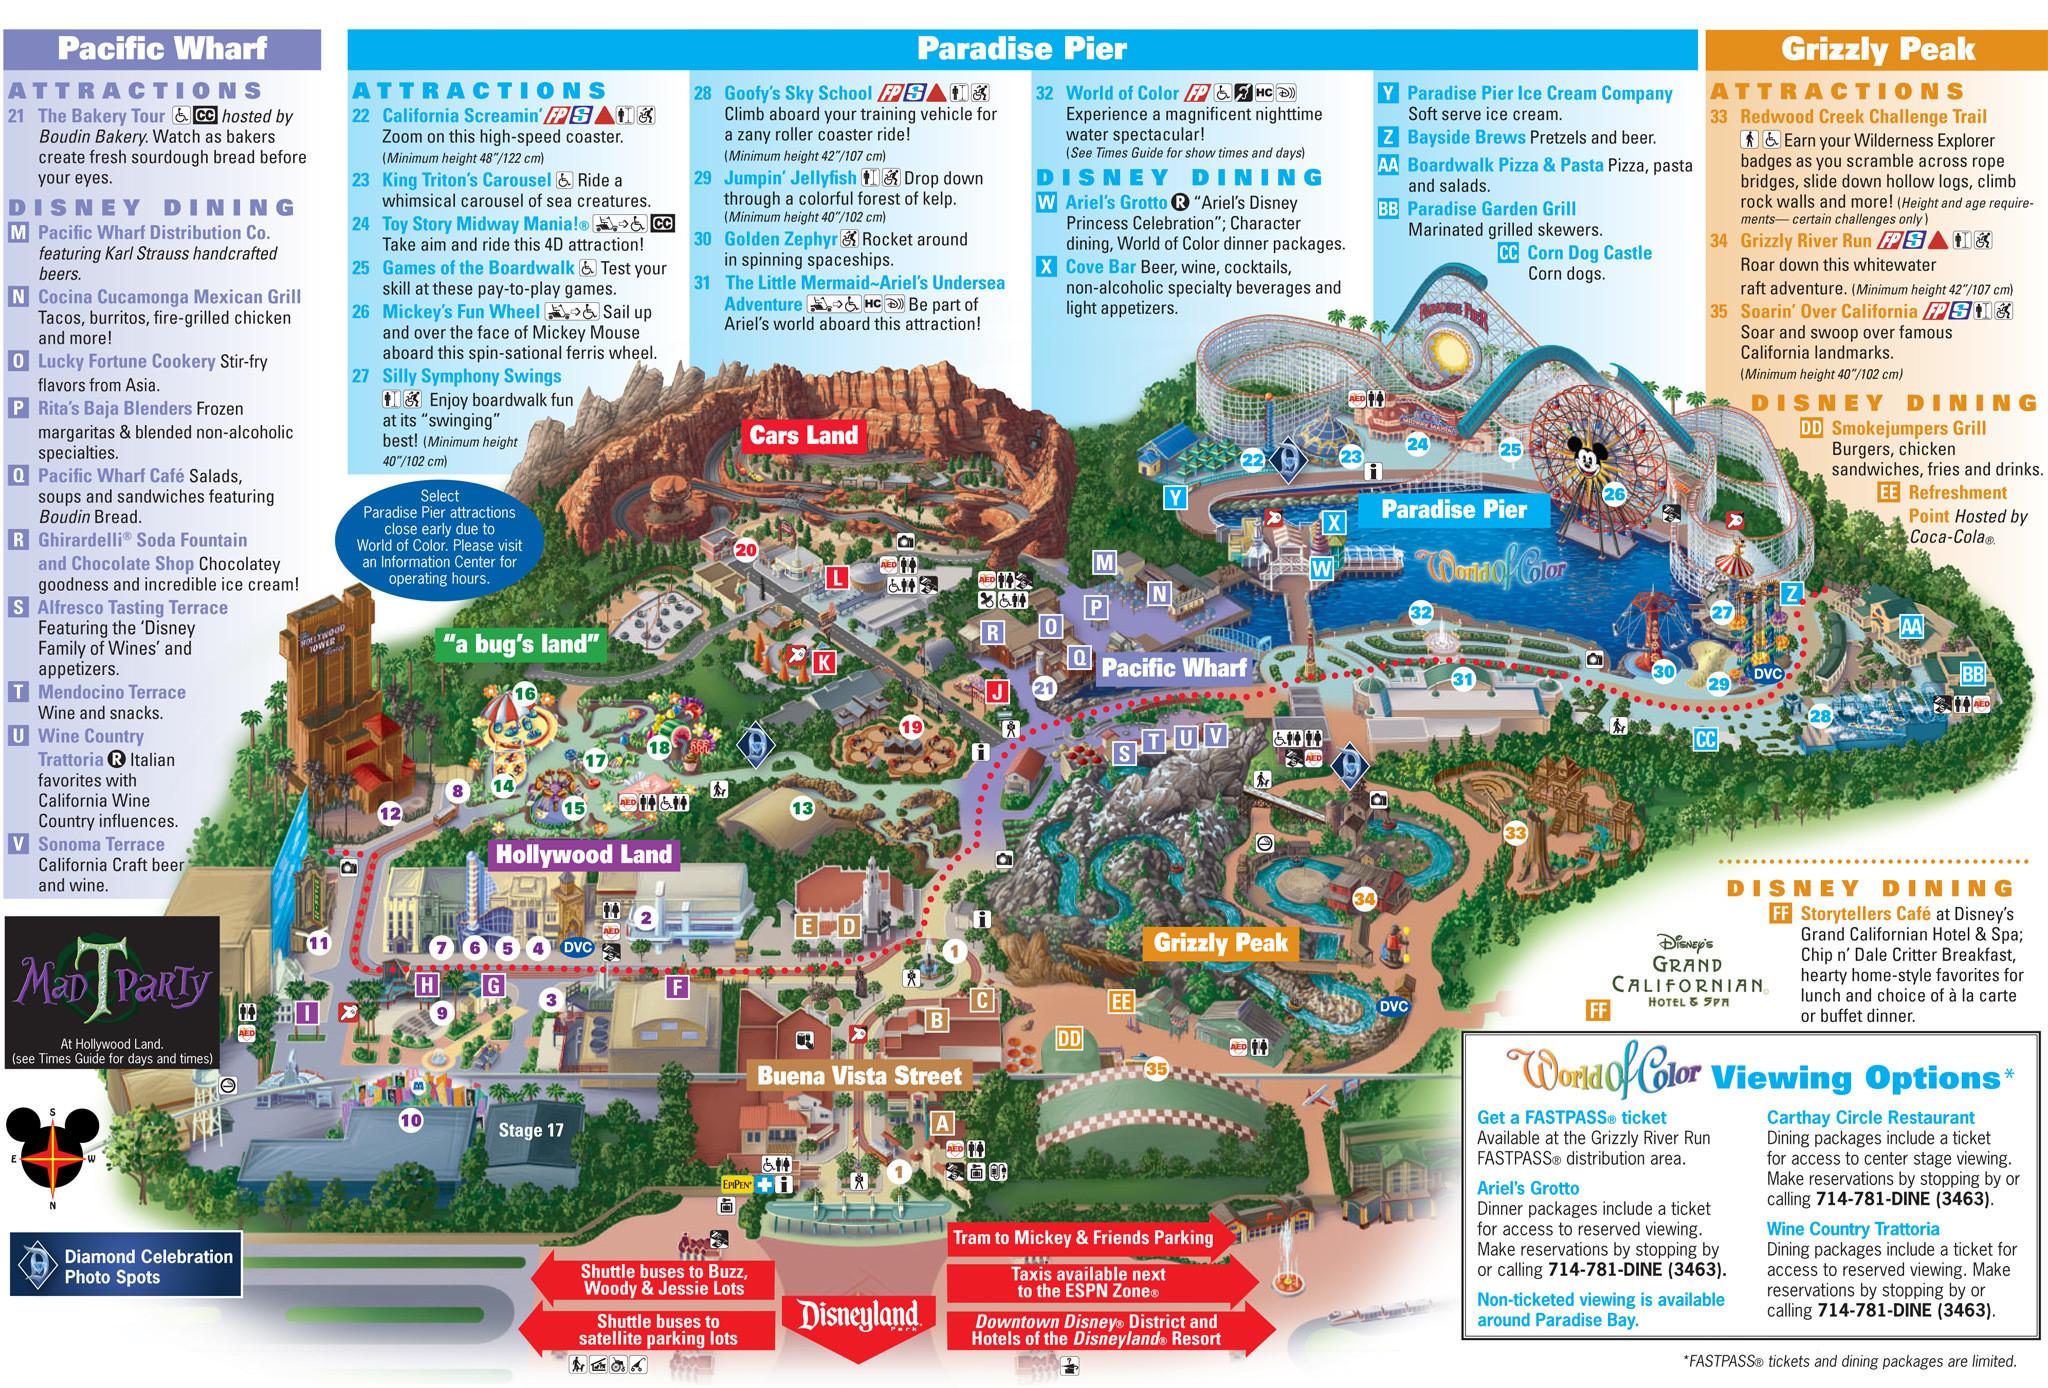 Disneyland California Adventure Map From Ettcarworld 9 - Ameliabd - Disneyland California Map